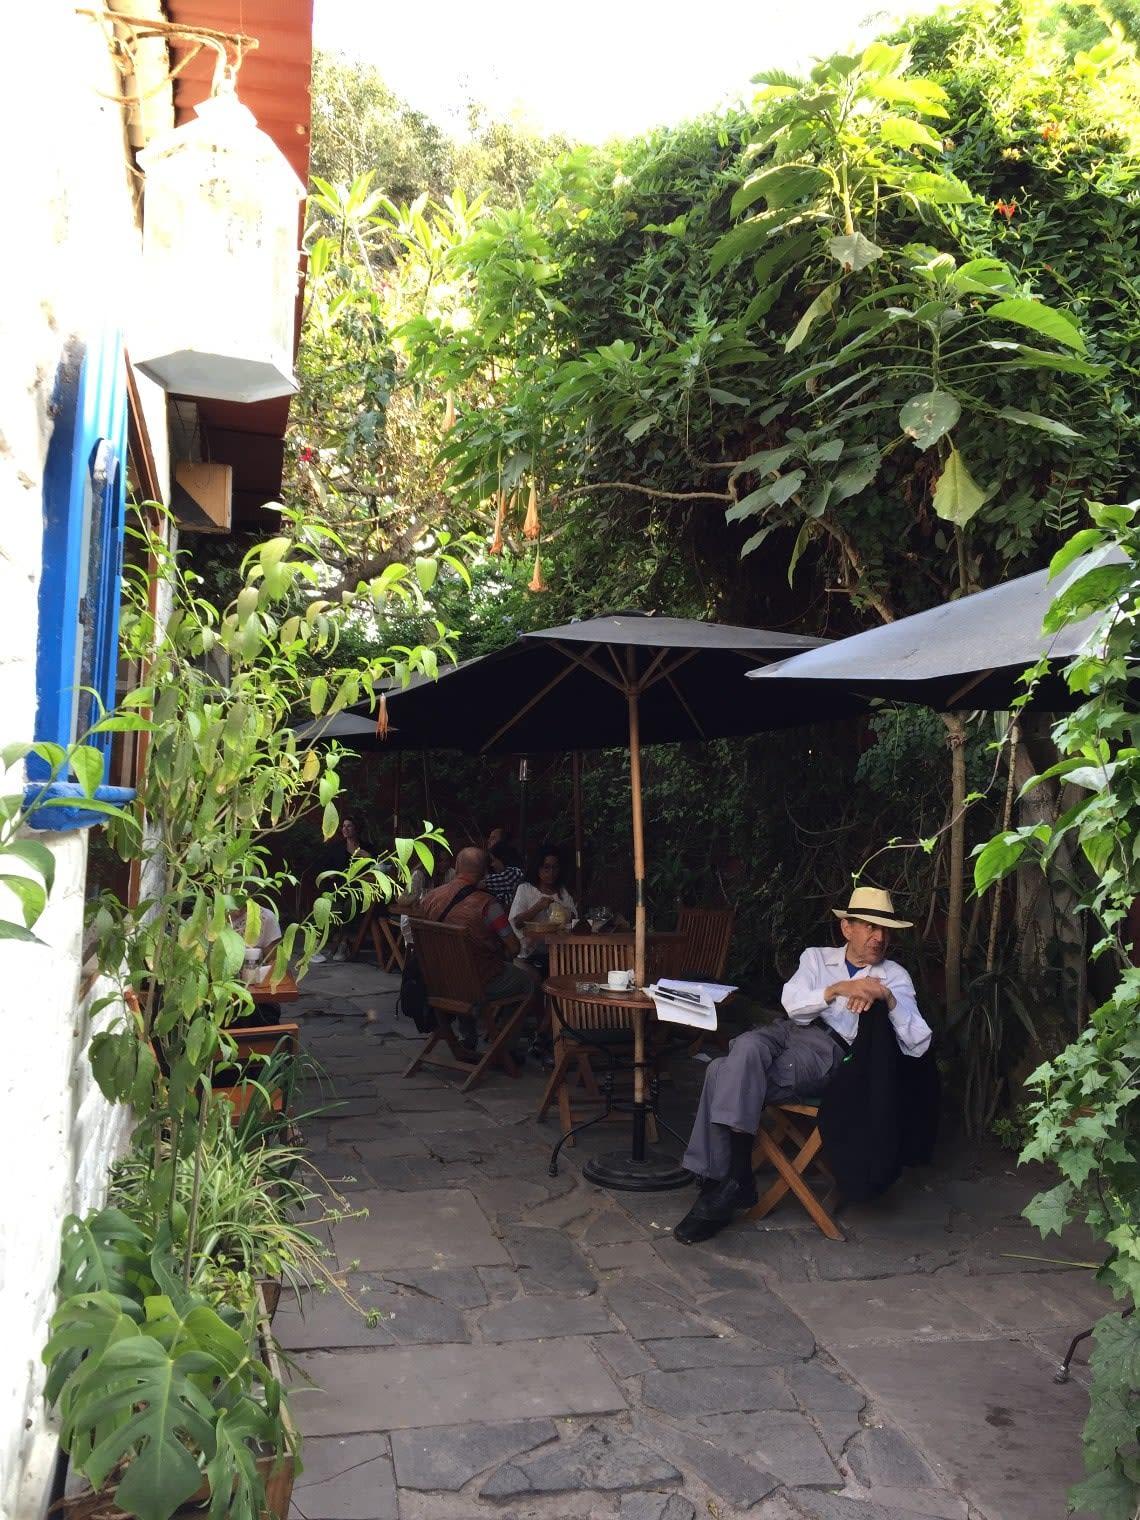 Barranco neighborhood, Lima, Peru